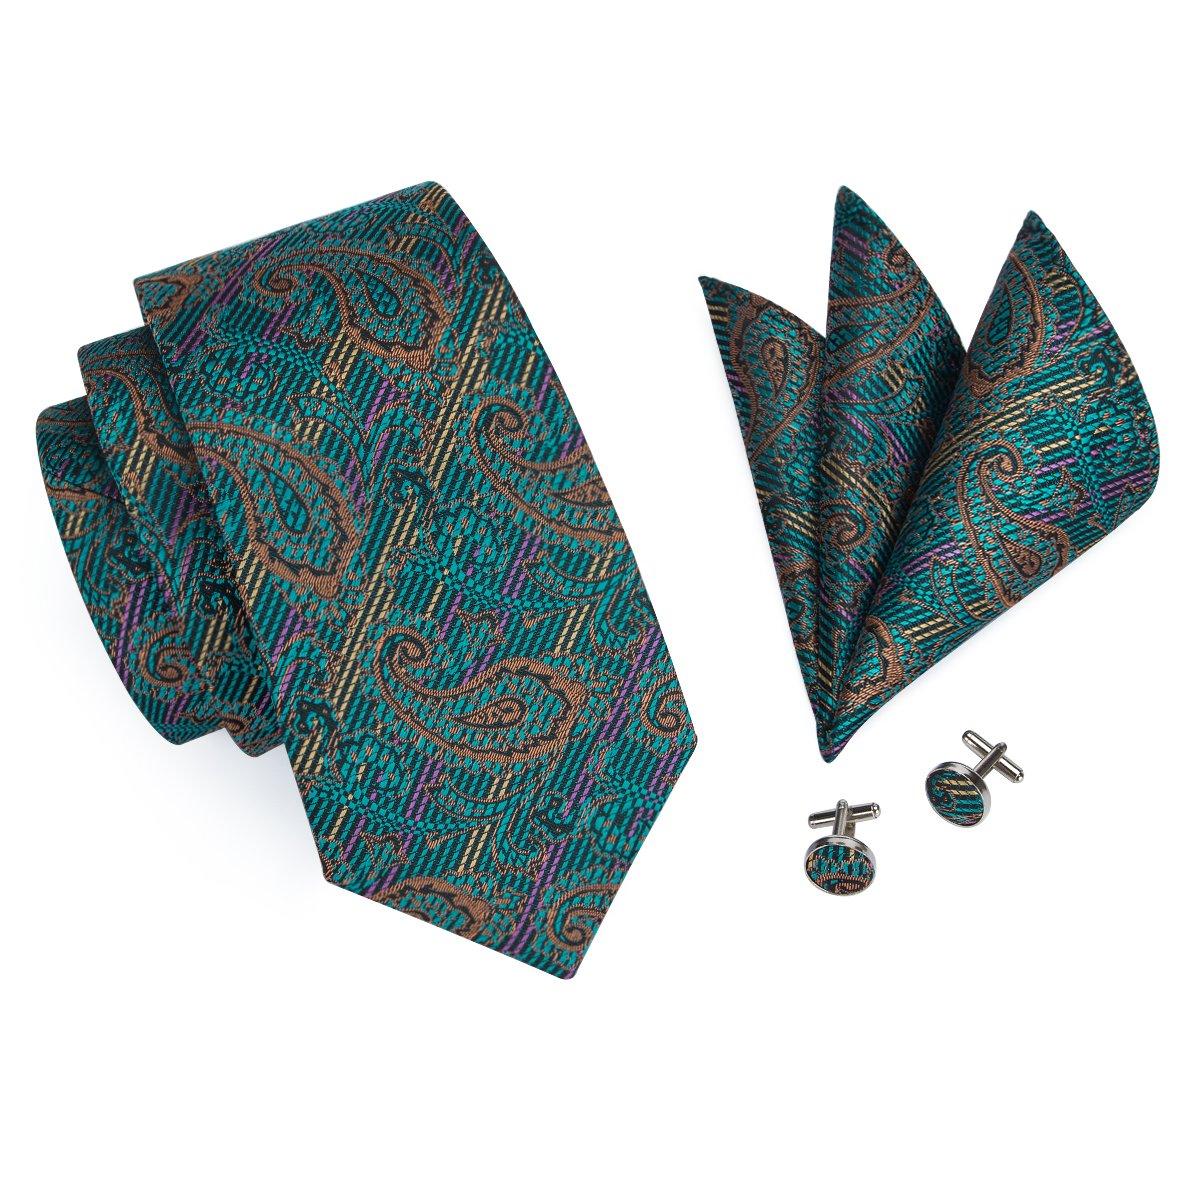 Barry.Wang Mens Retro Tie Cufflinks and Handkerchief Sets